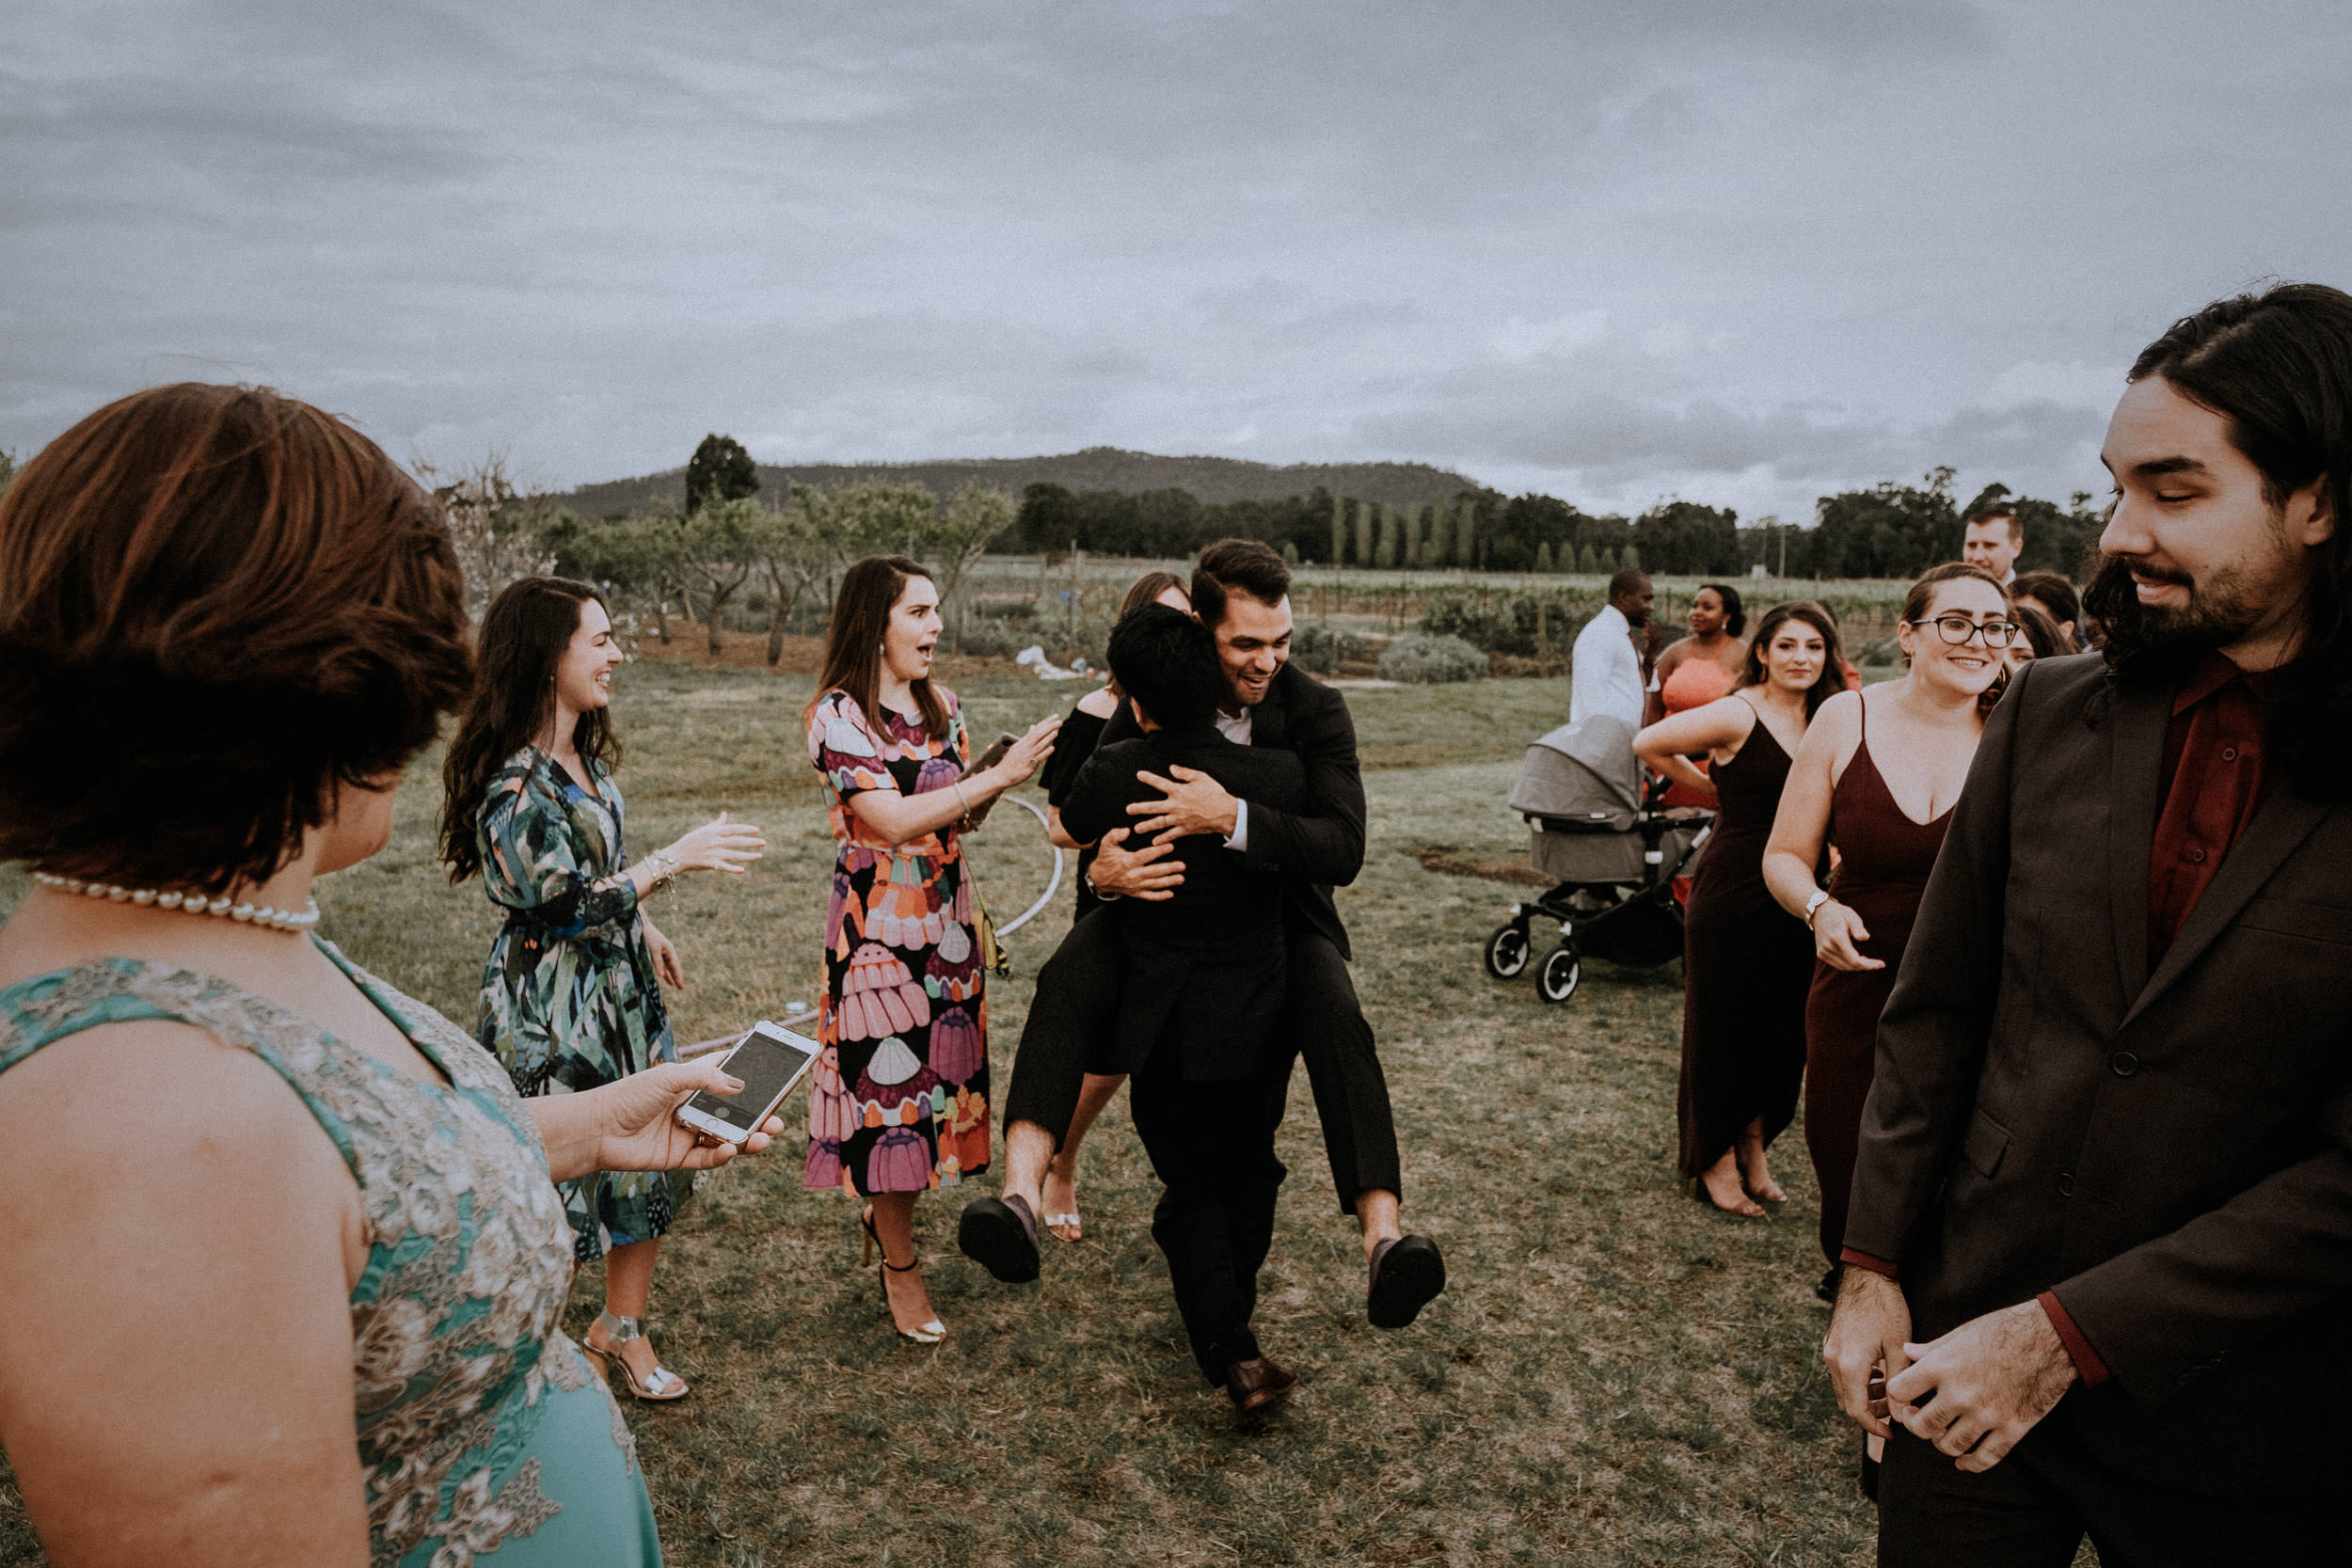 s+j_top_elopement wedding photography_kings & thieves_blog - 363.jpg